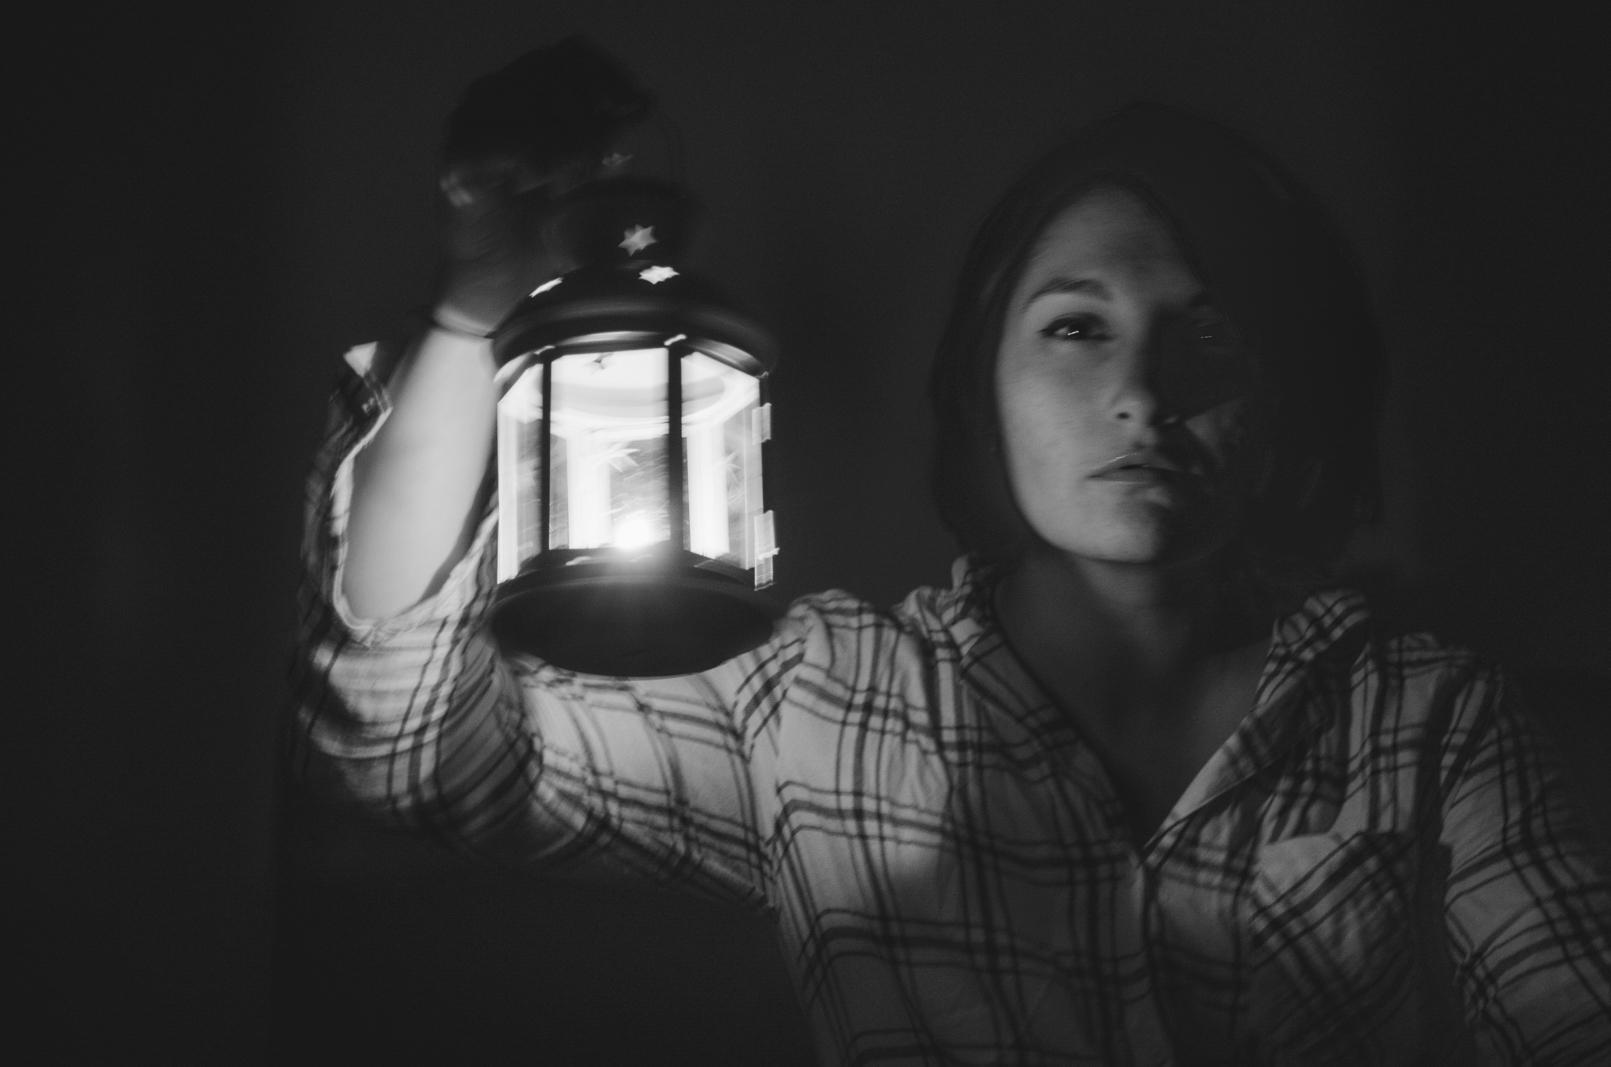 Self portrait blurry